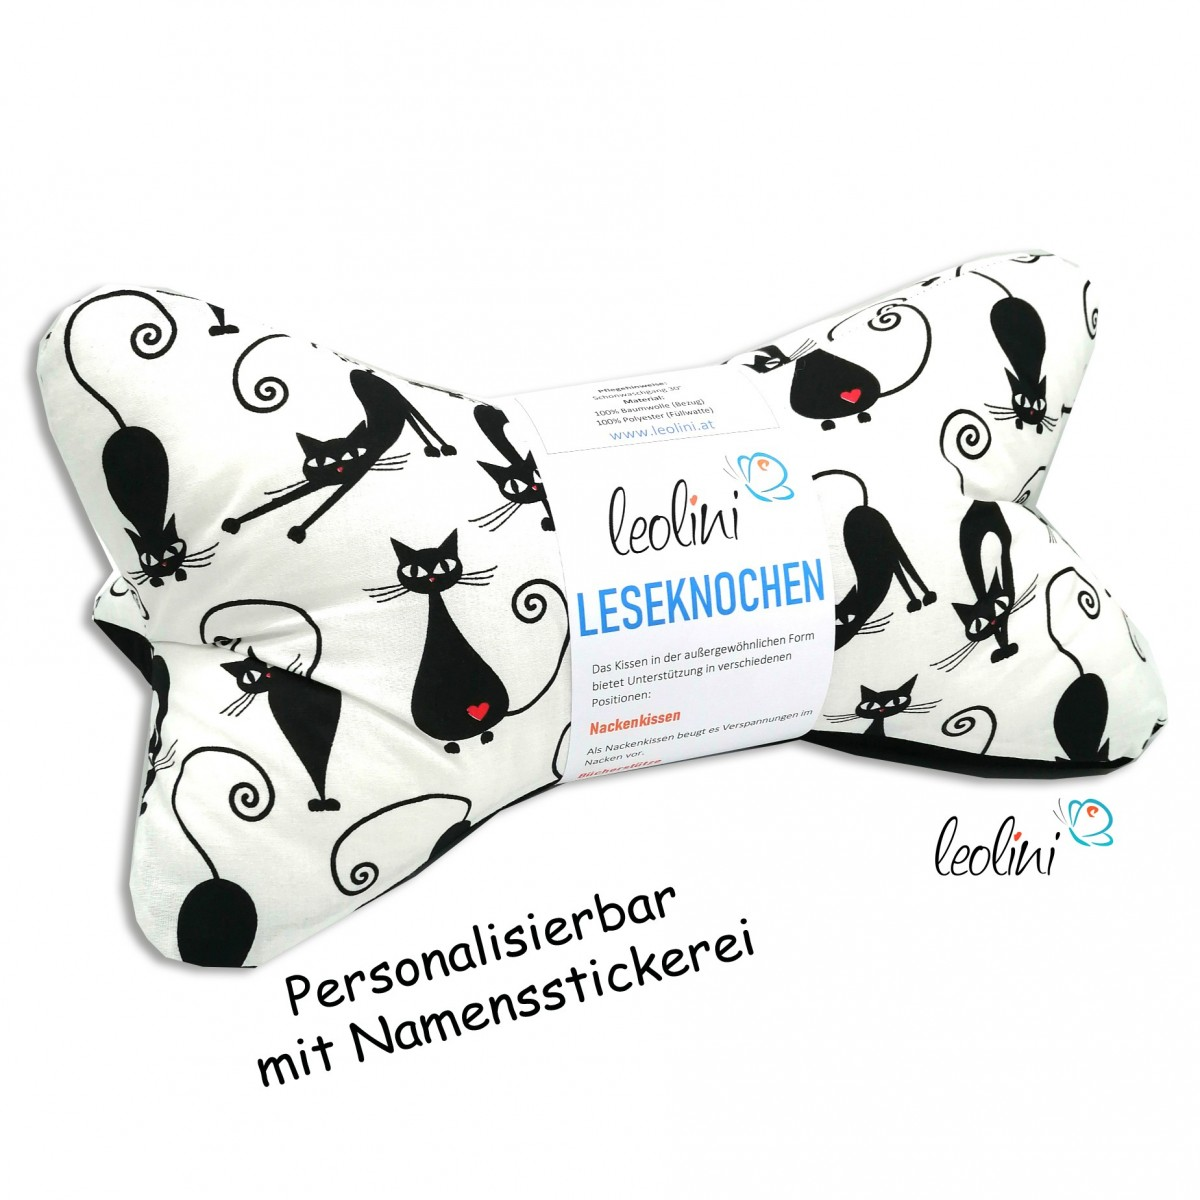 Leseknochen - Lesekissen von Leolini crazy cats mit Namen